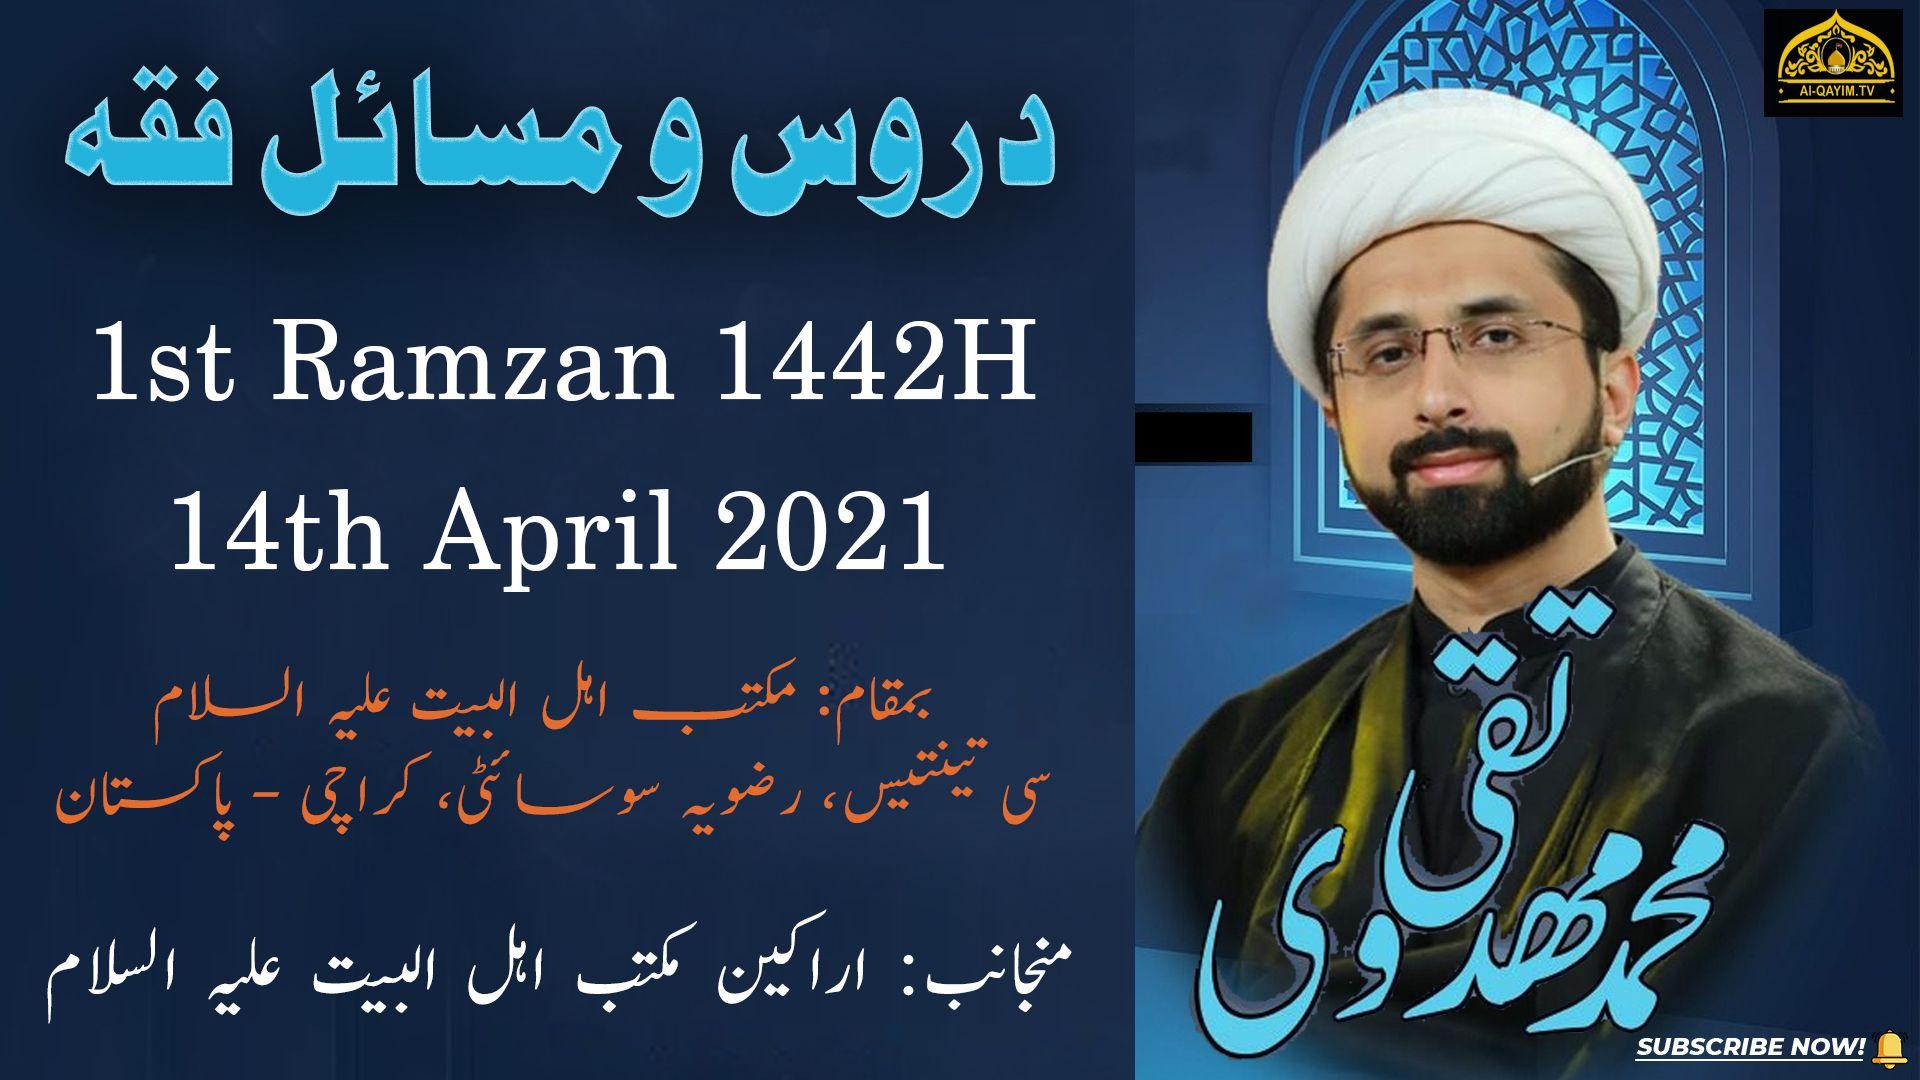 Moulana Muhammad Taqi Mehdavi   Dars Wo Masail Fiqae   1st Ramzan 2021   Maktab-e-Ahlebait - Karachi